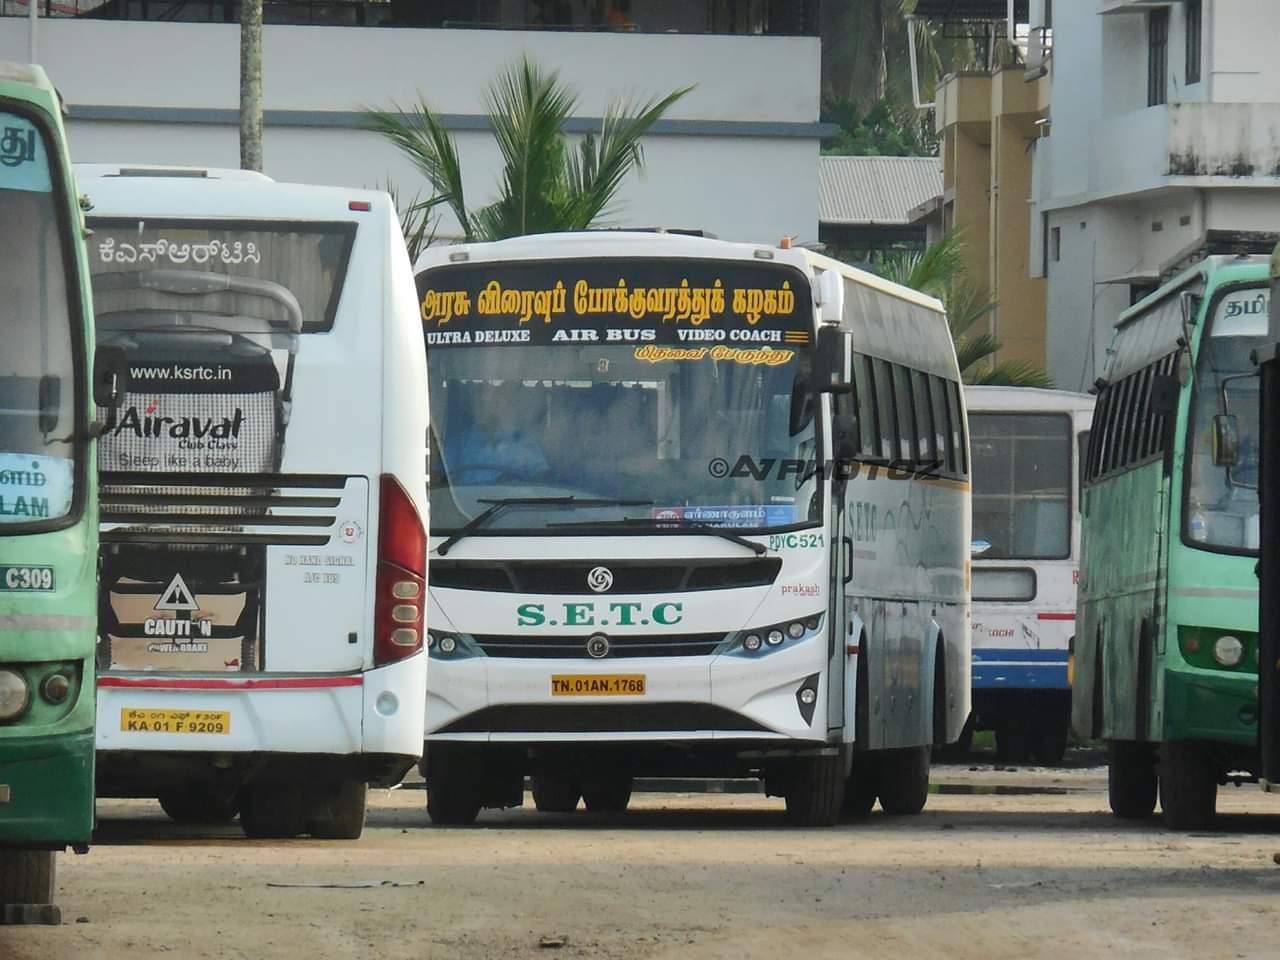 SETC Bus Timings Srirangam to Trivandrum